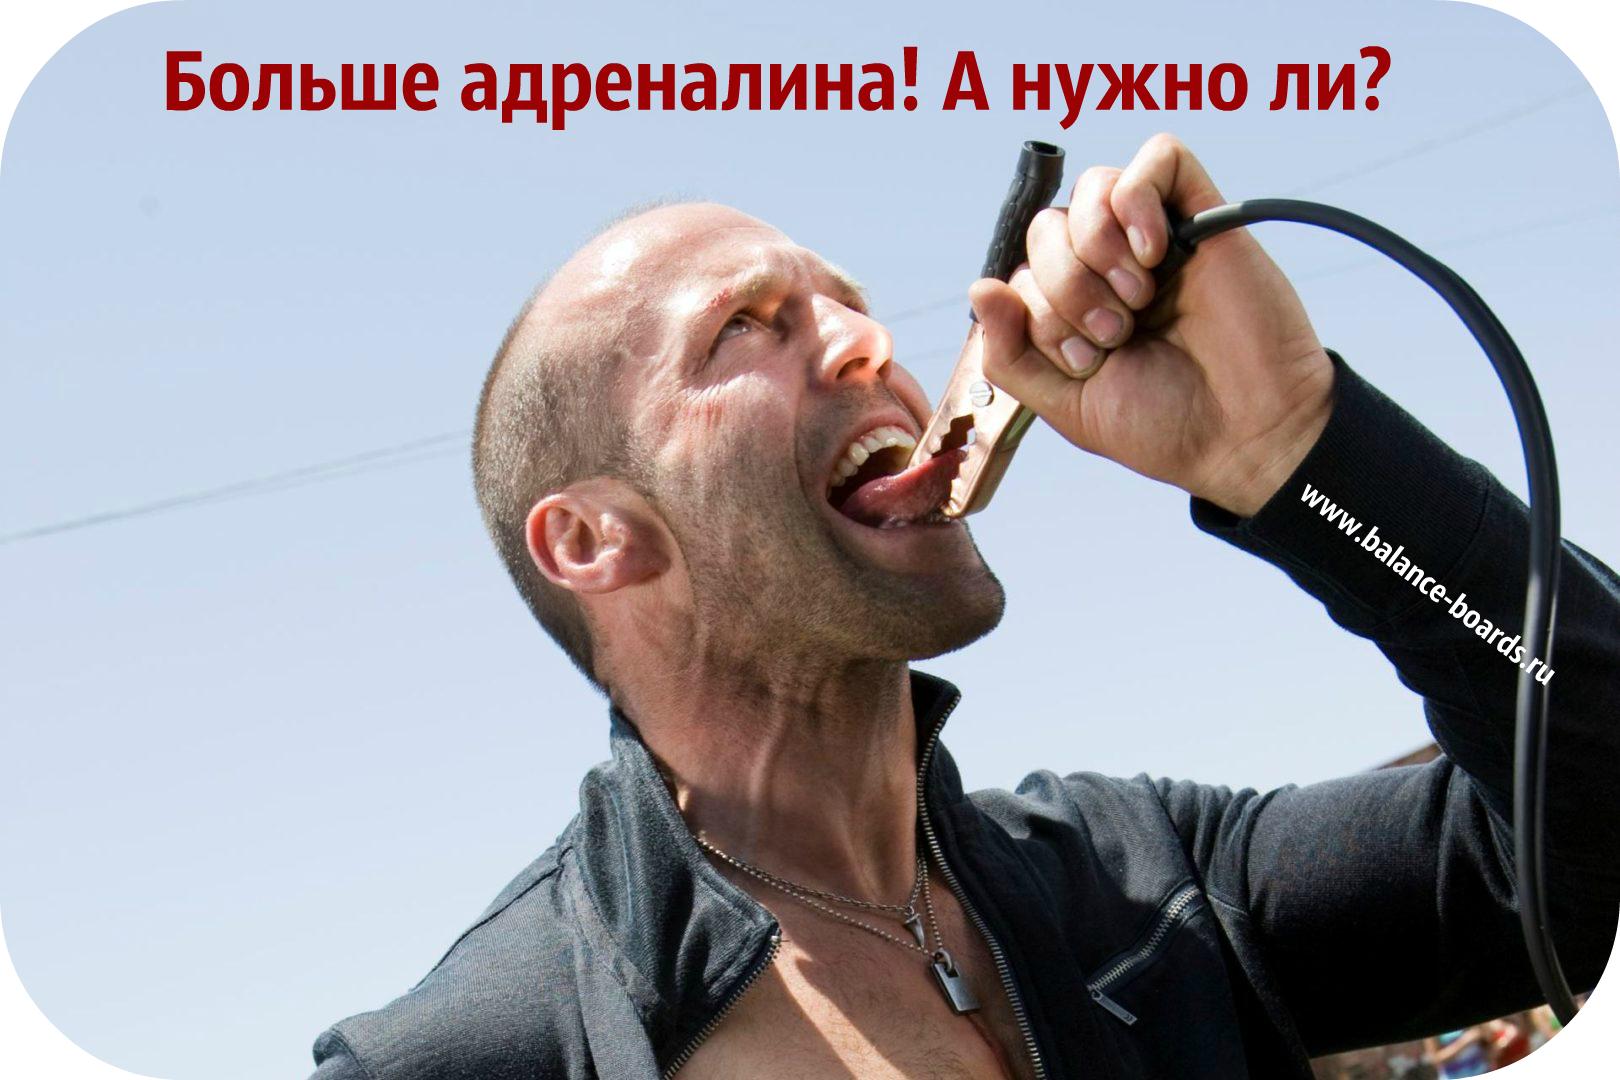 http://www.balance-boards.ru/images/upload/Больше%20адреналина%20А%20нужно%20ли.jpg